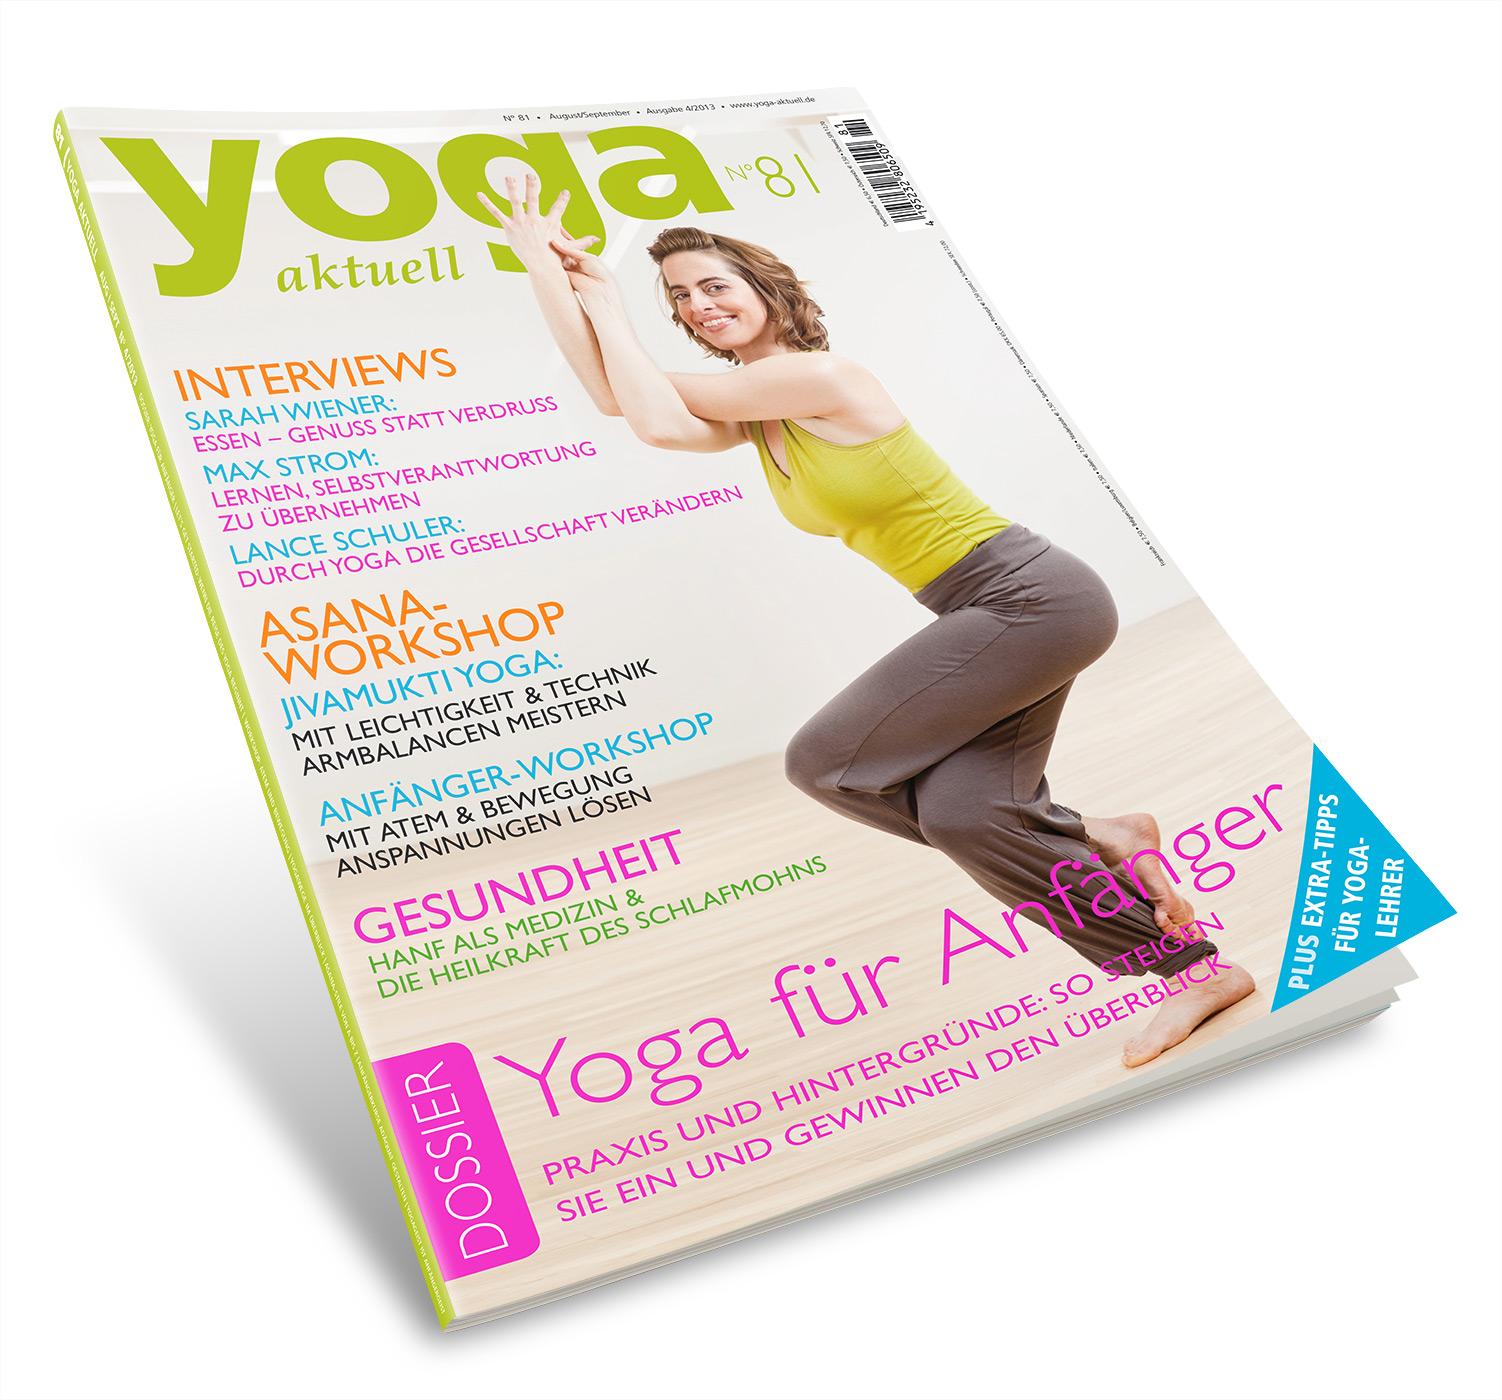 Yoga Aktuell 81 - 04/2013